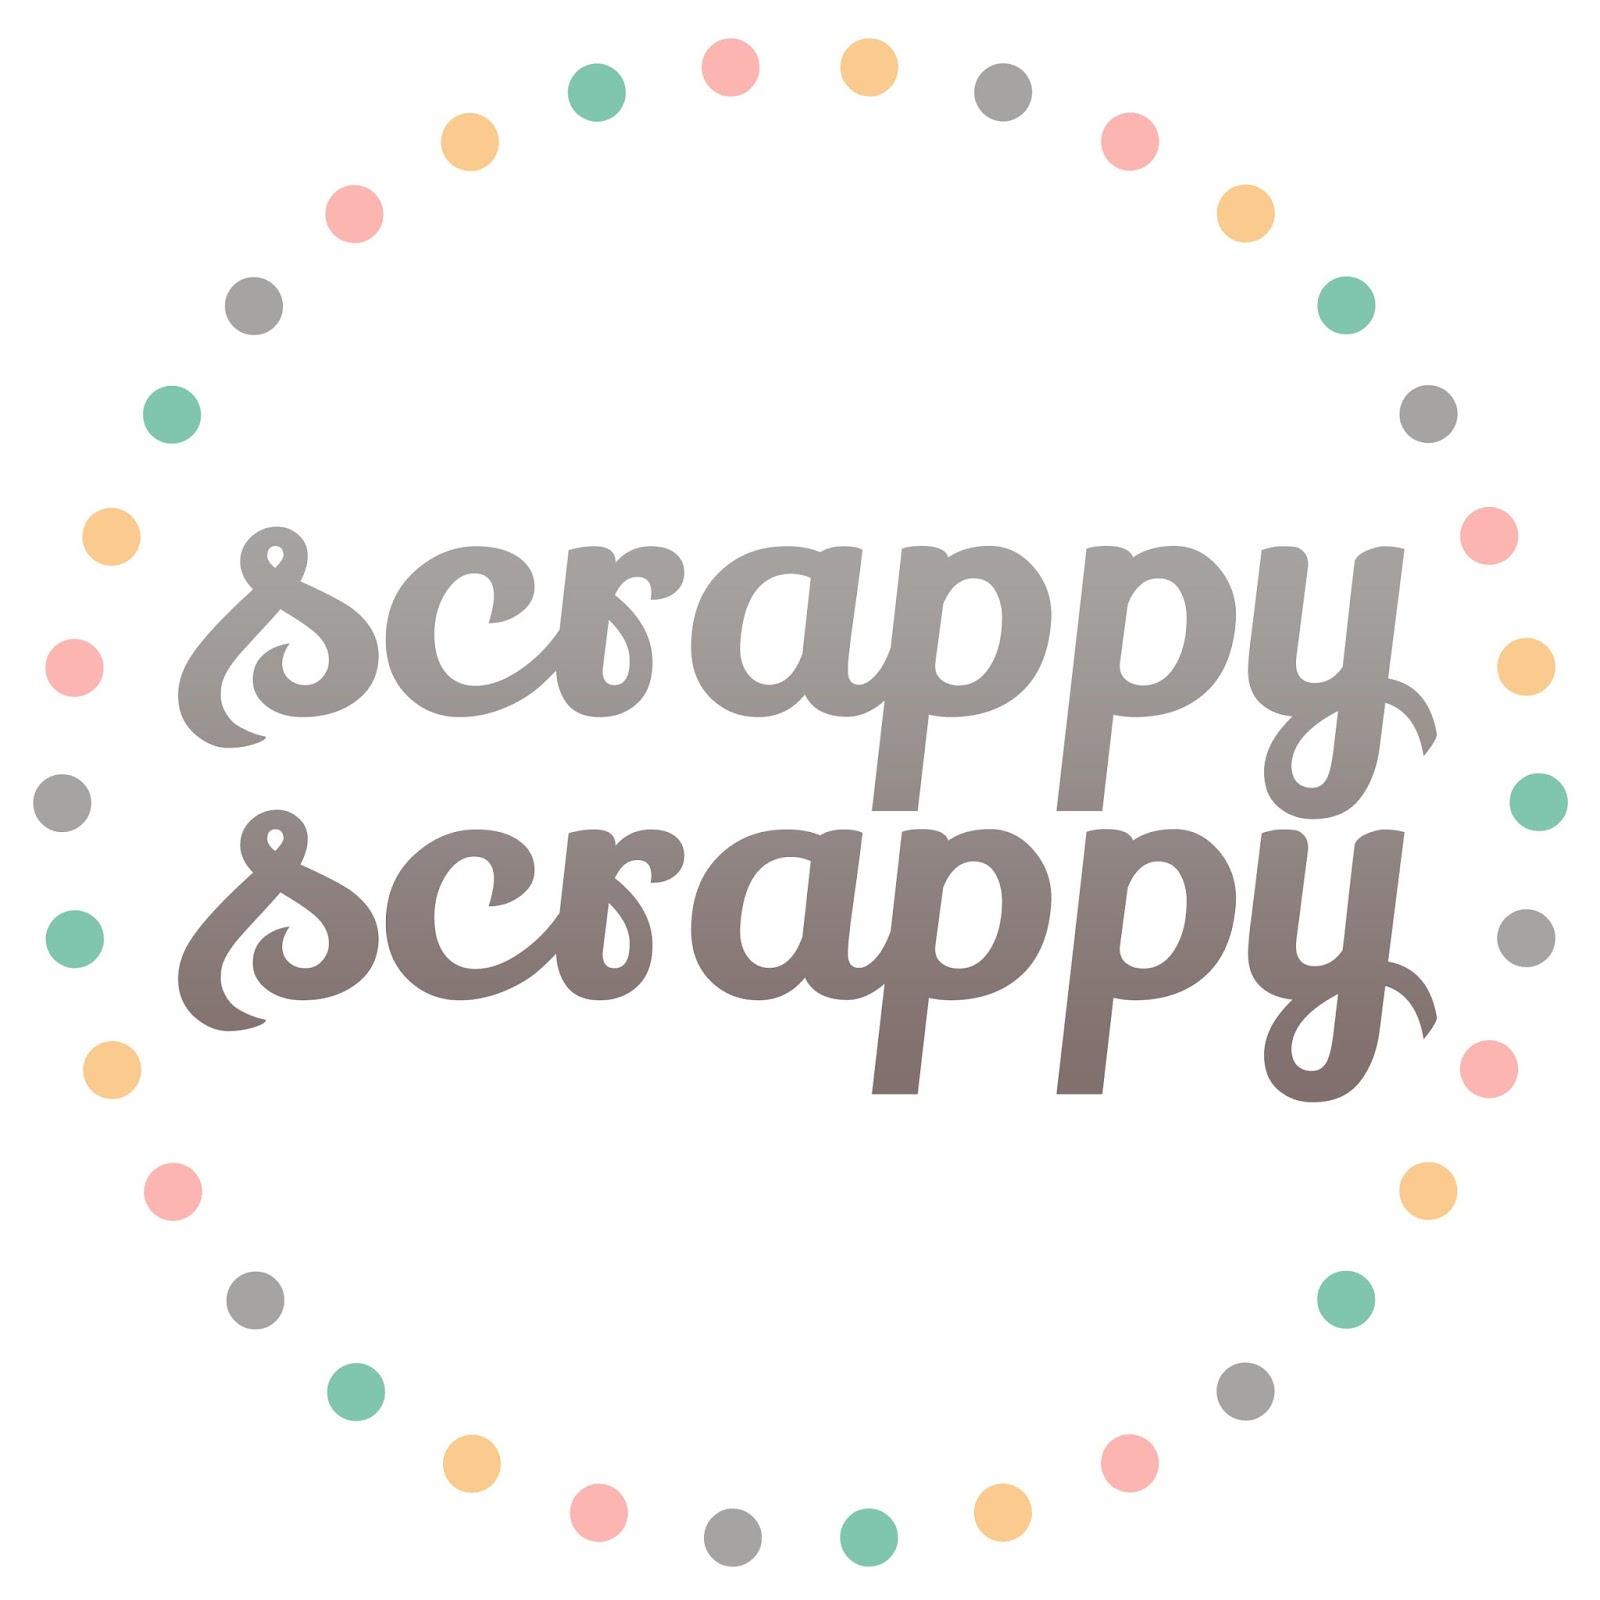 Scrappy Scrappy